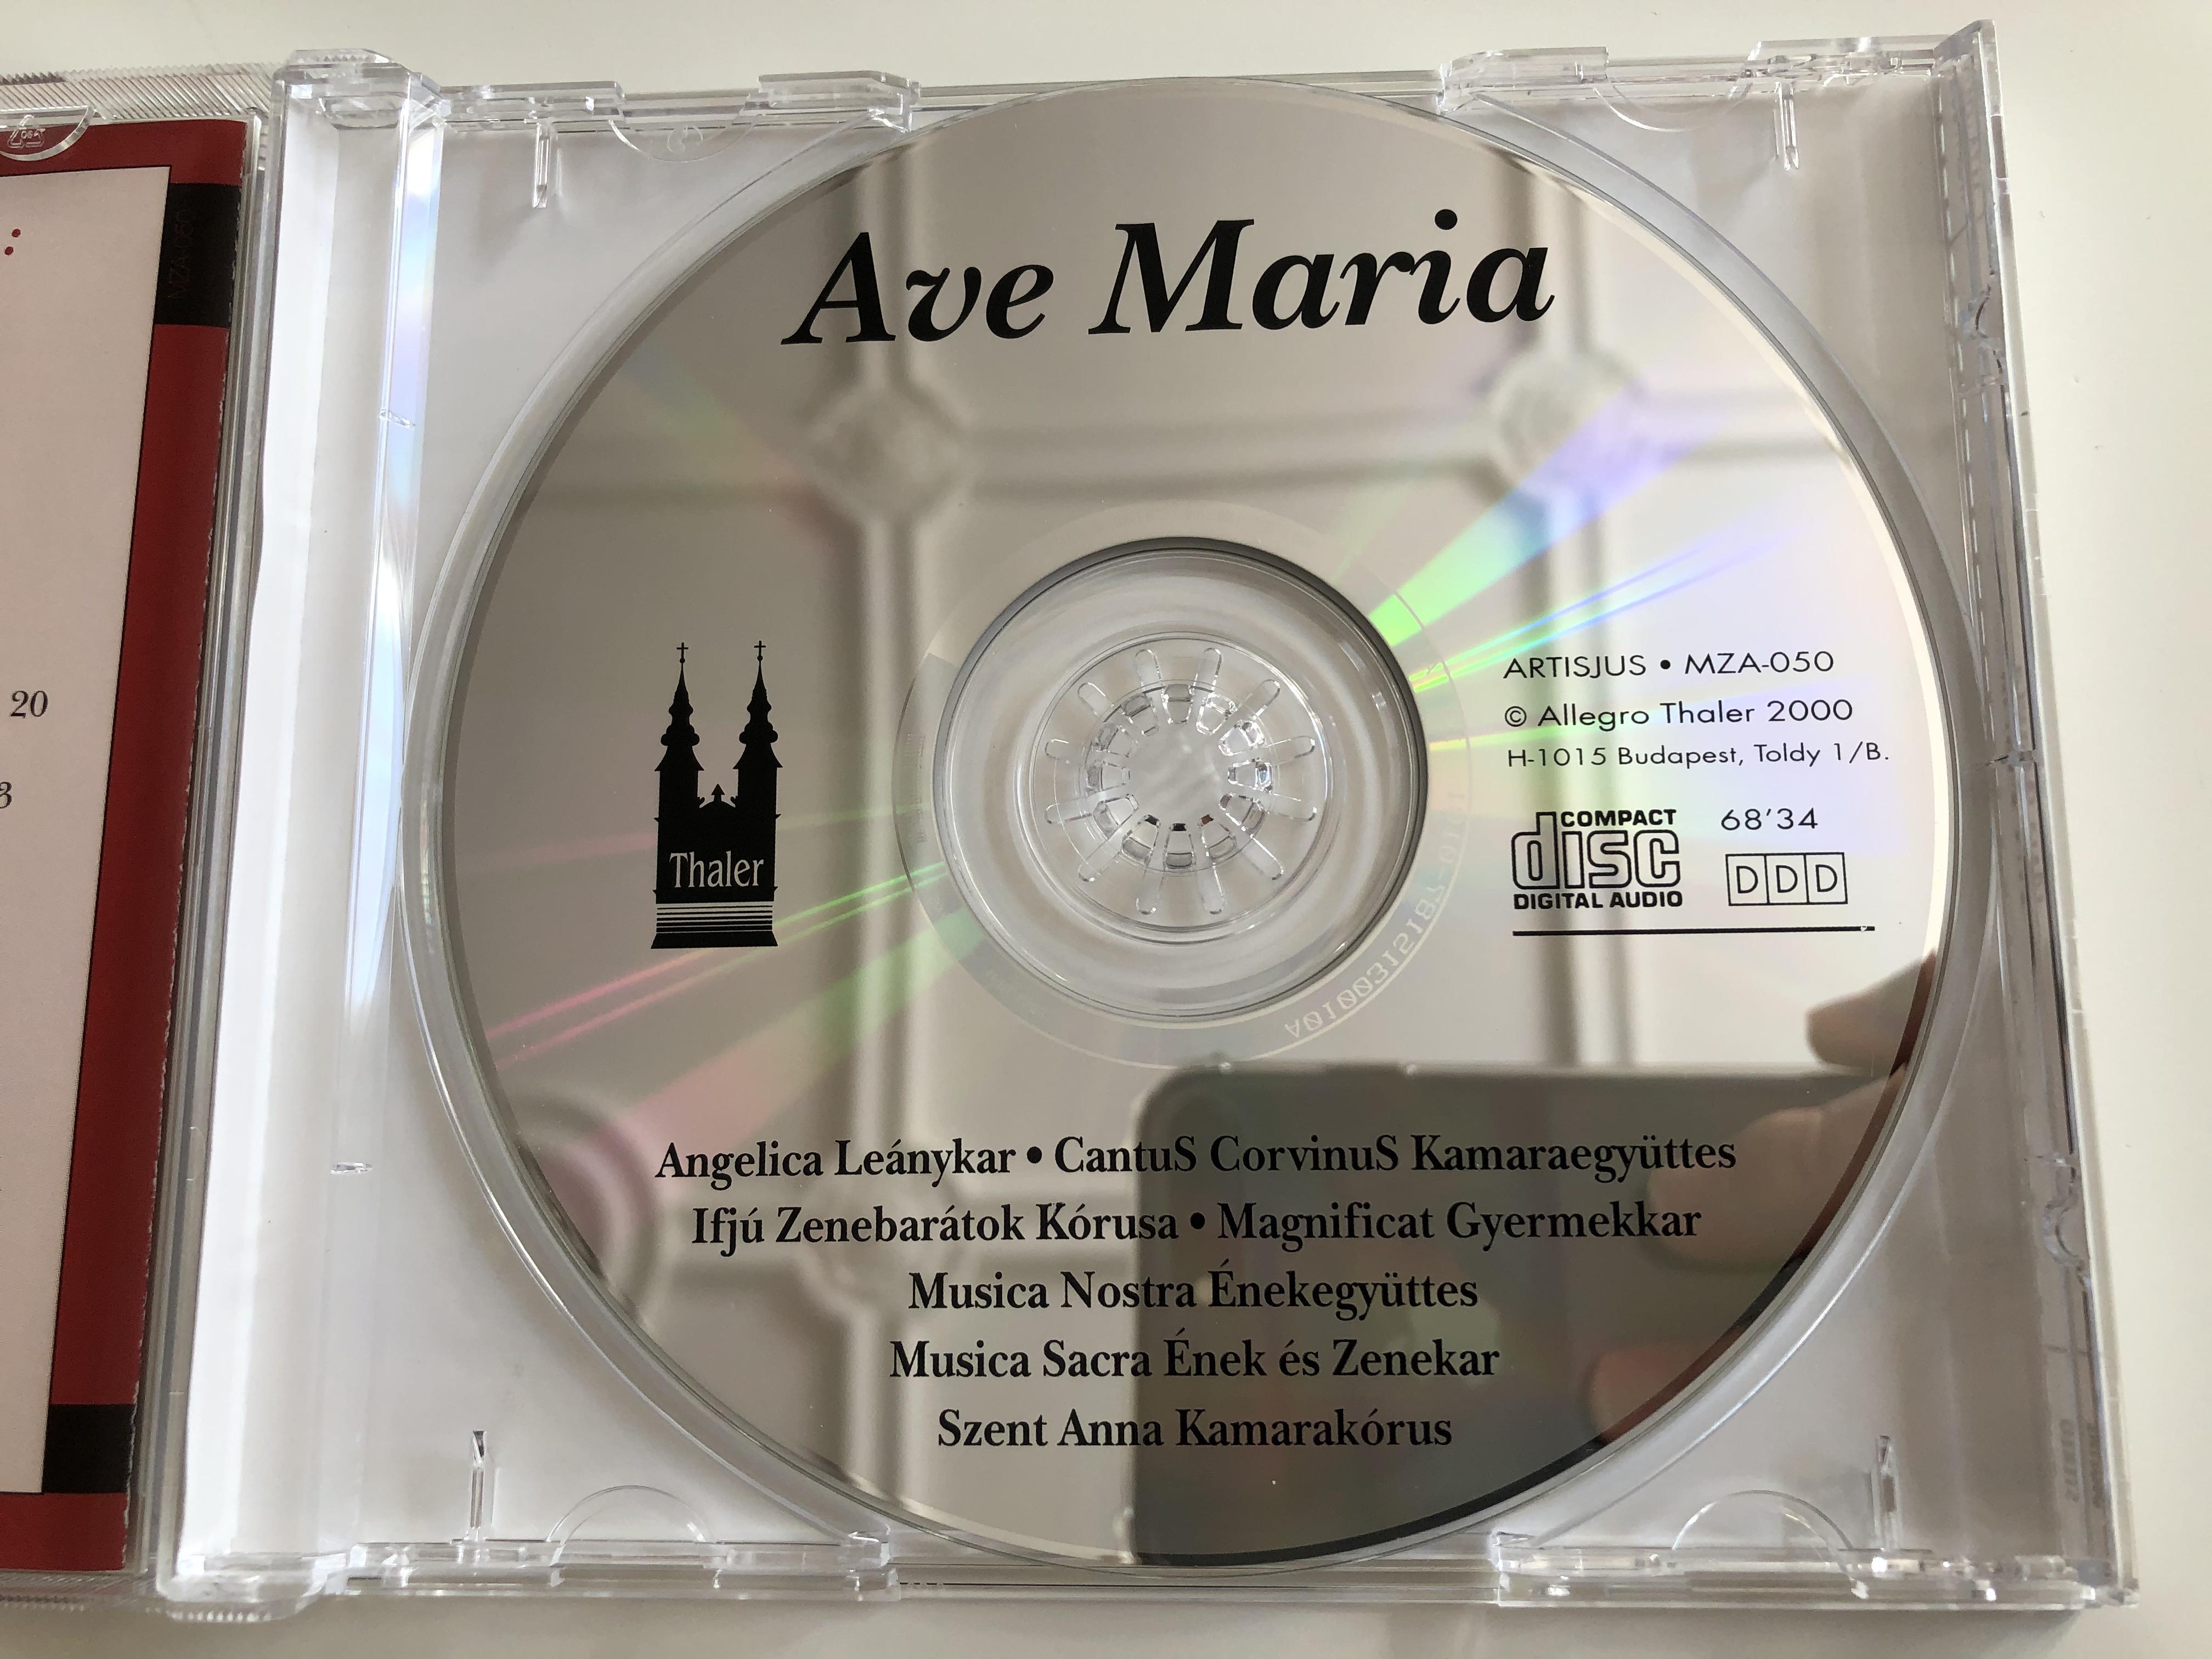 ave-maria-caccini-schubert-gounod-bruckner-allegro-thaler-audio-cd-2000-mza-05-4-.jpg